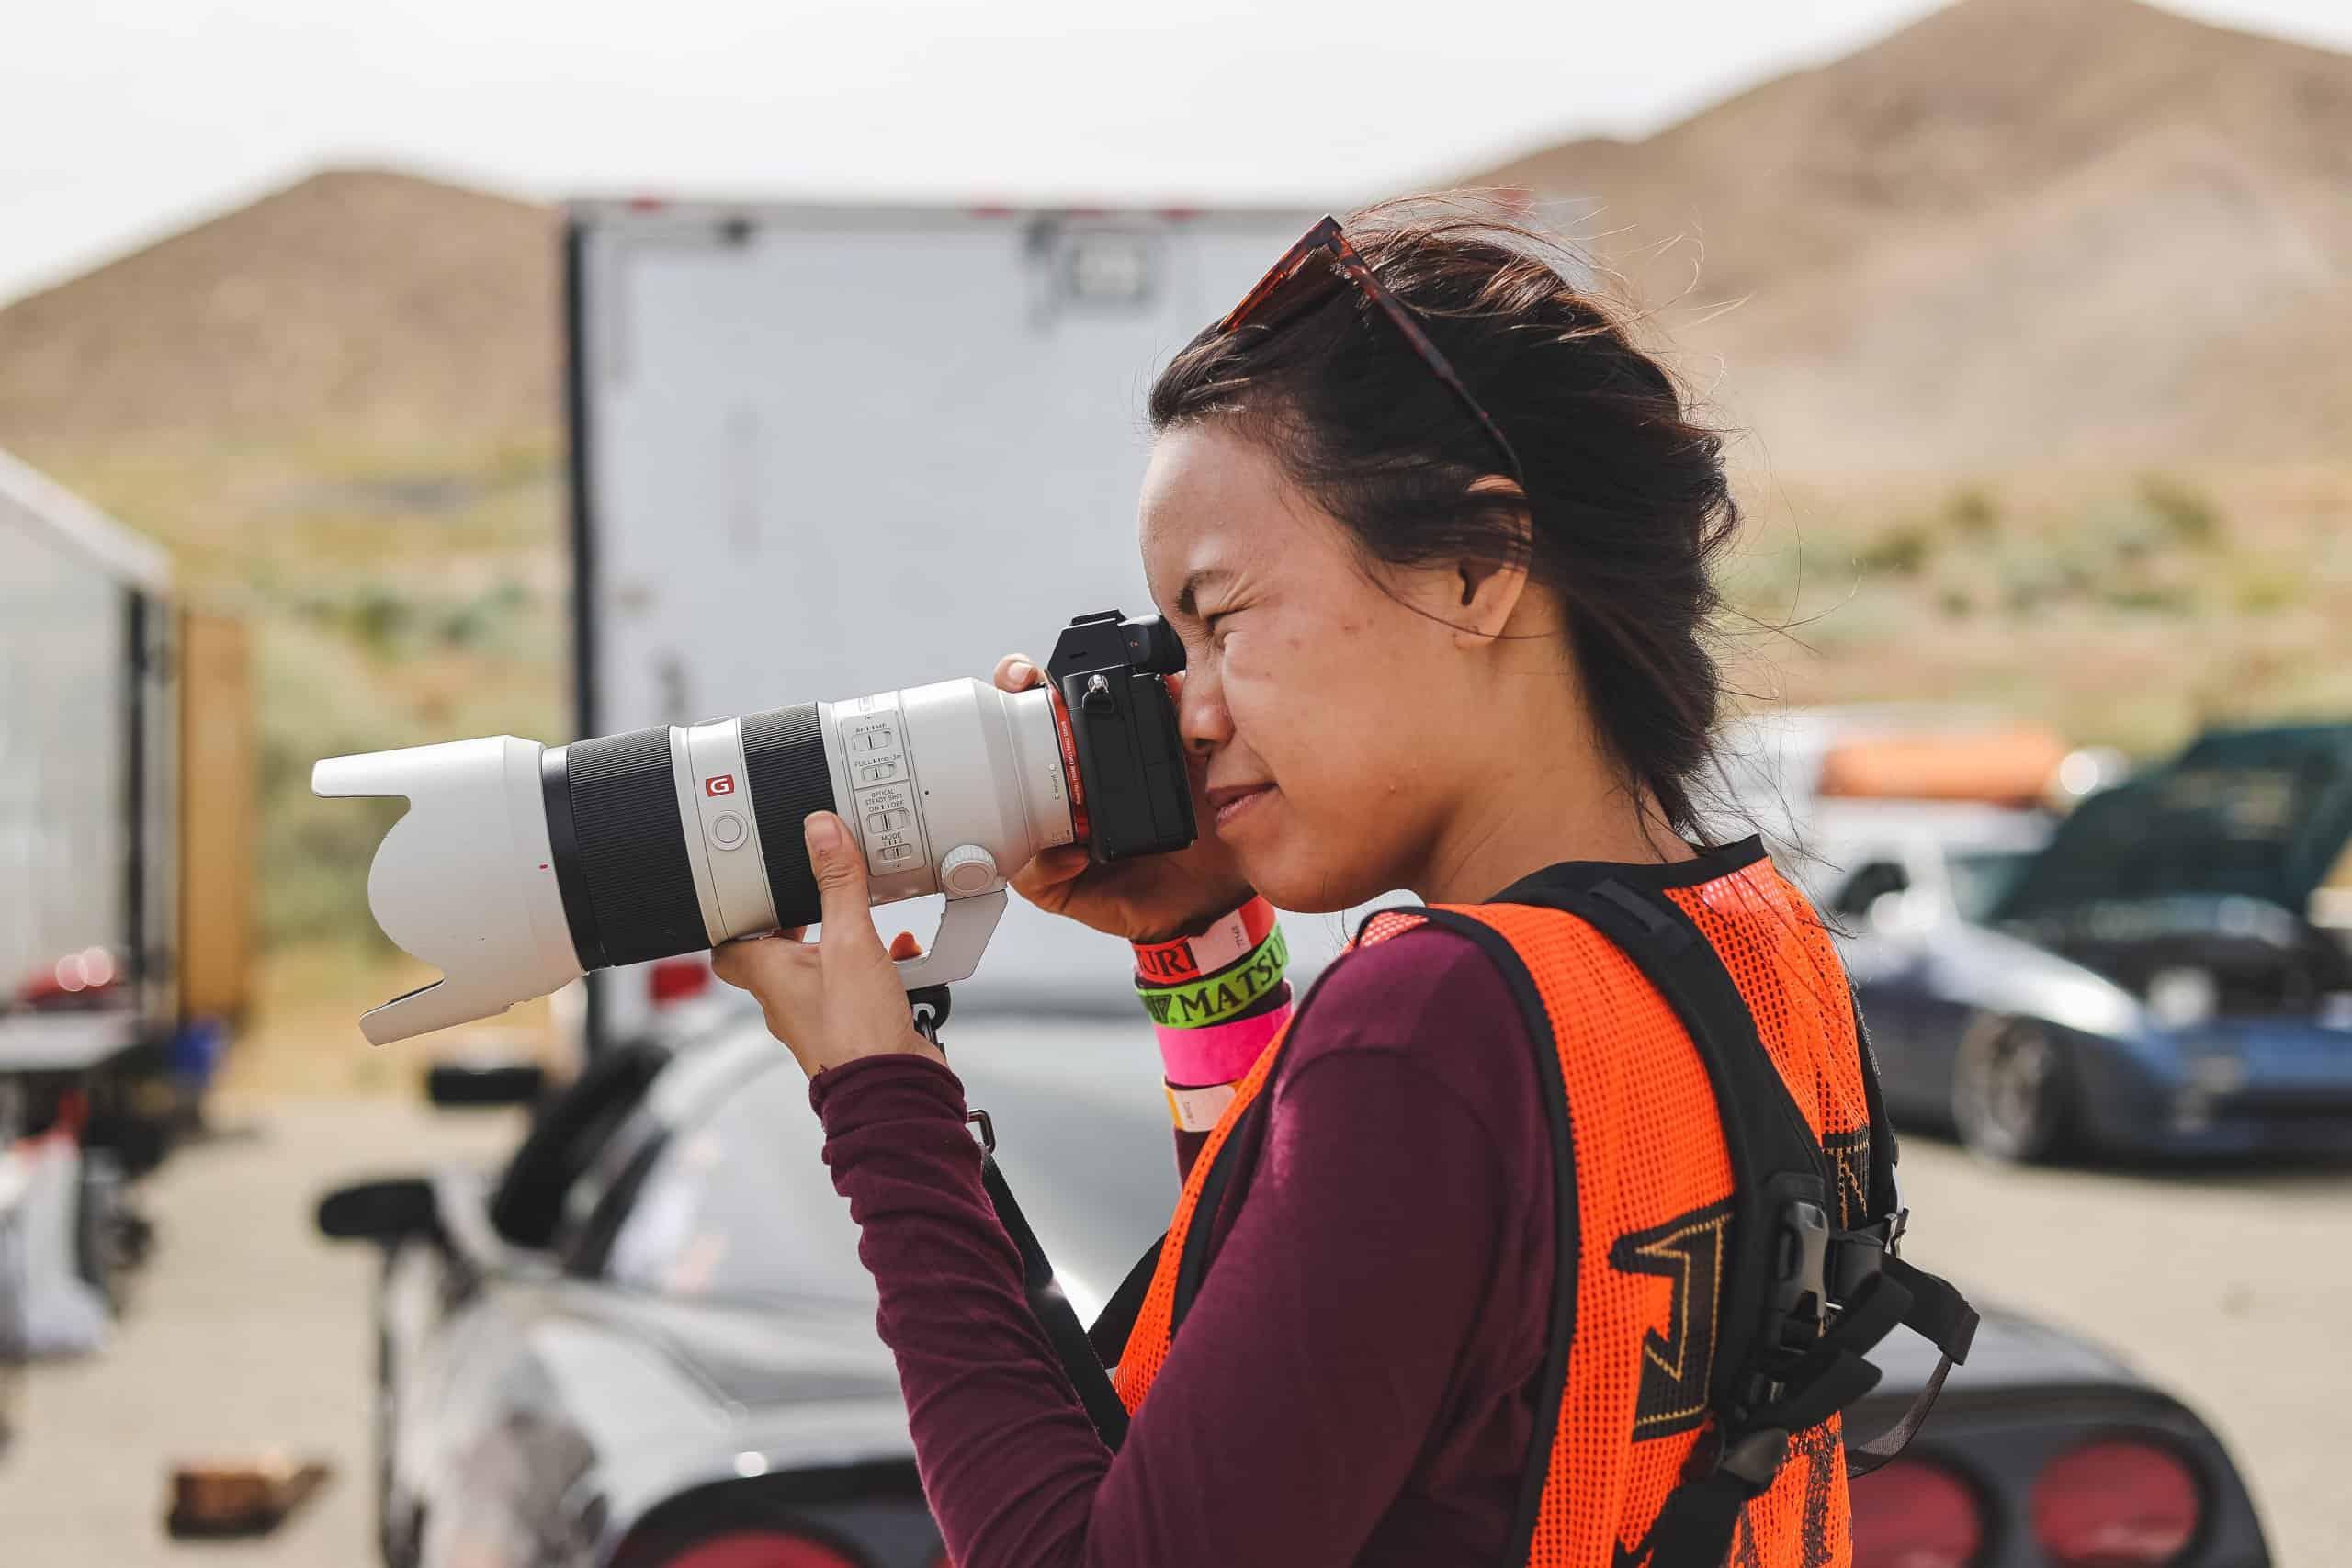 Nguyen shooting drifting